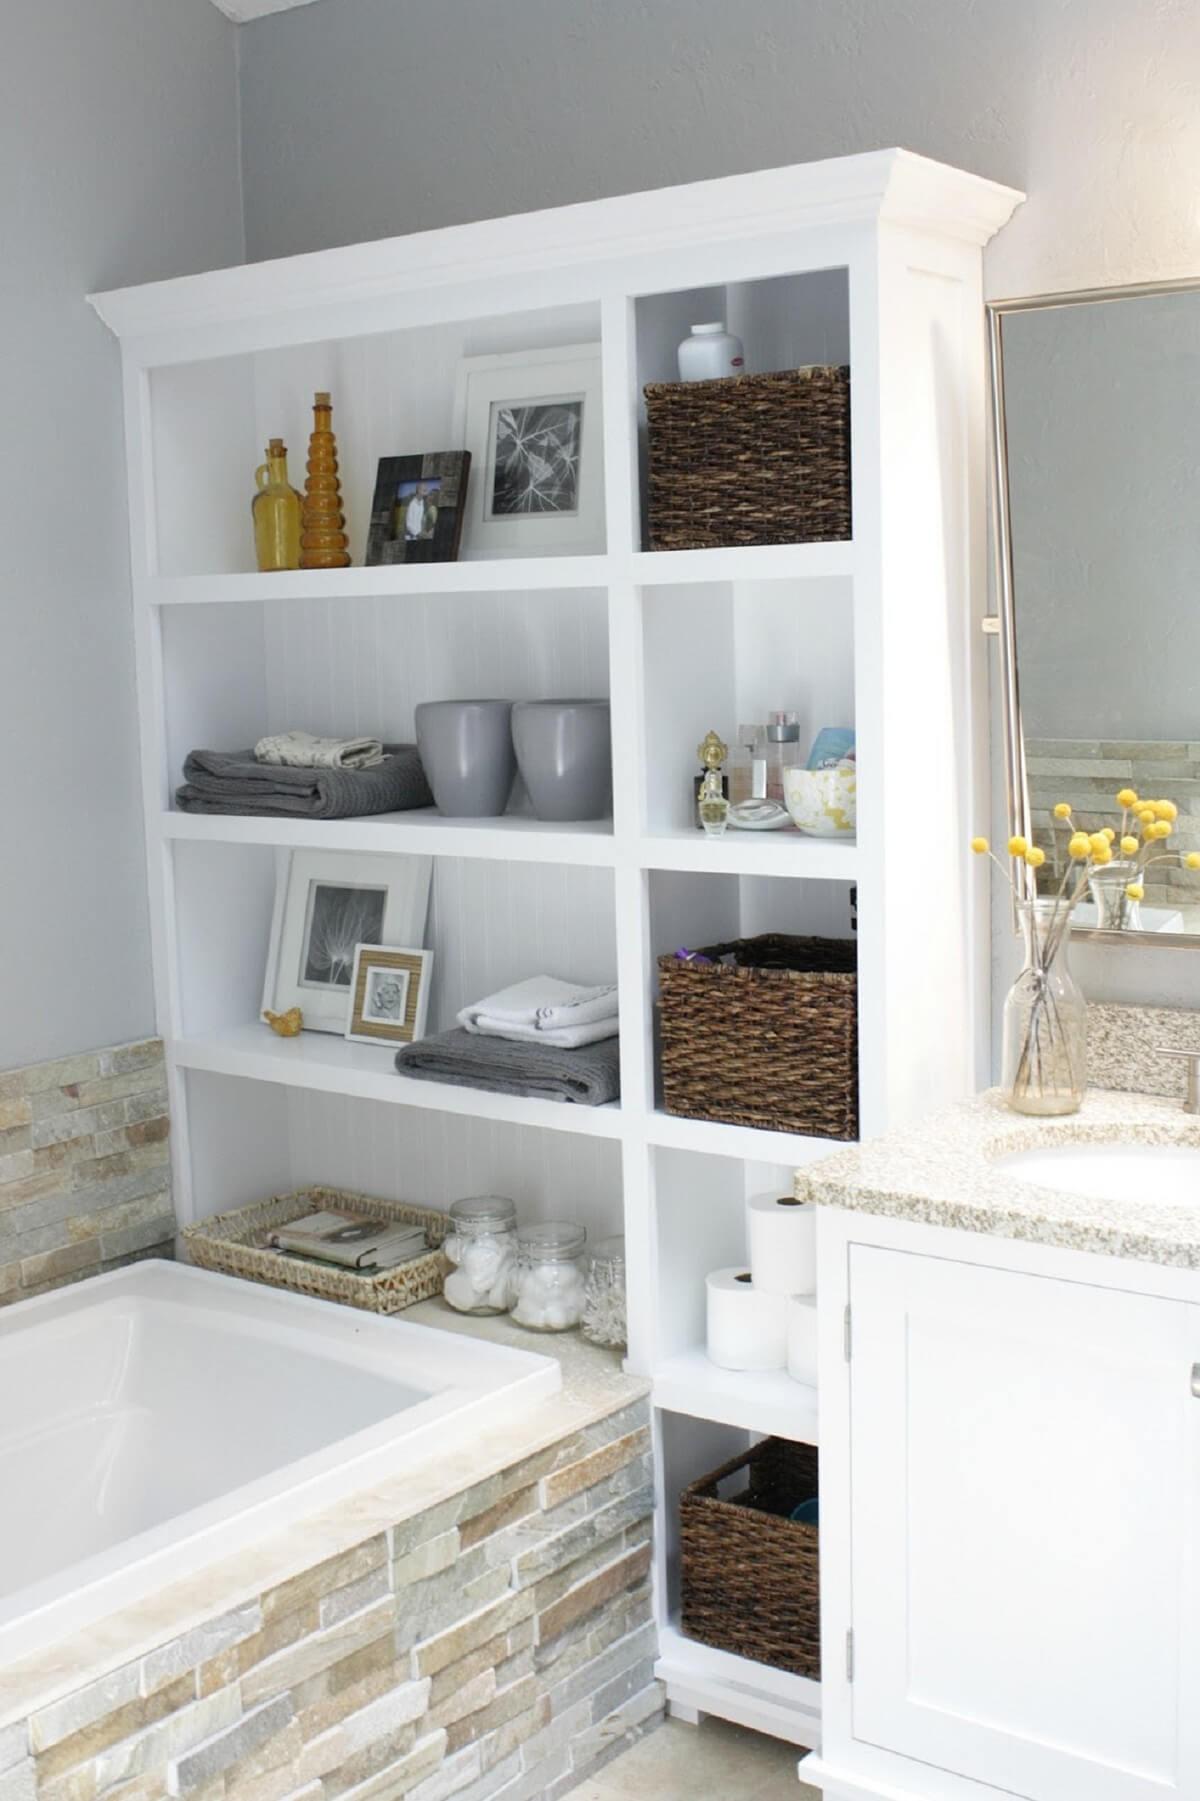 Bathroom Storage Ideas Inspirational Best Small Bathroom Storage Ideas and Tips for Portrait